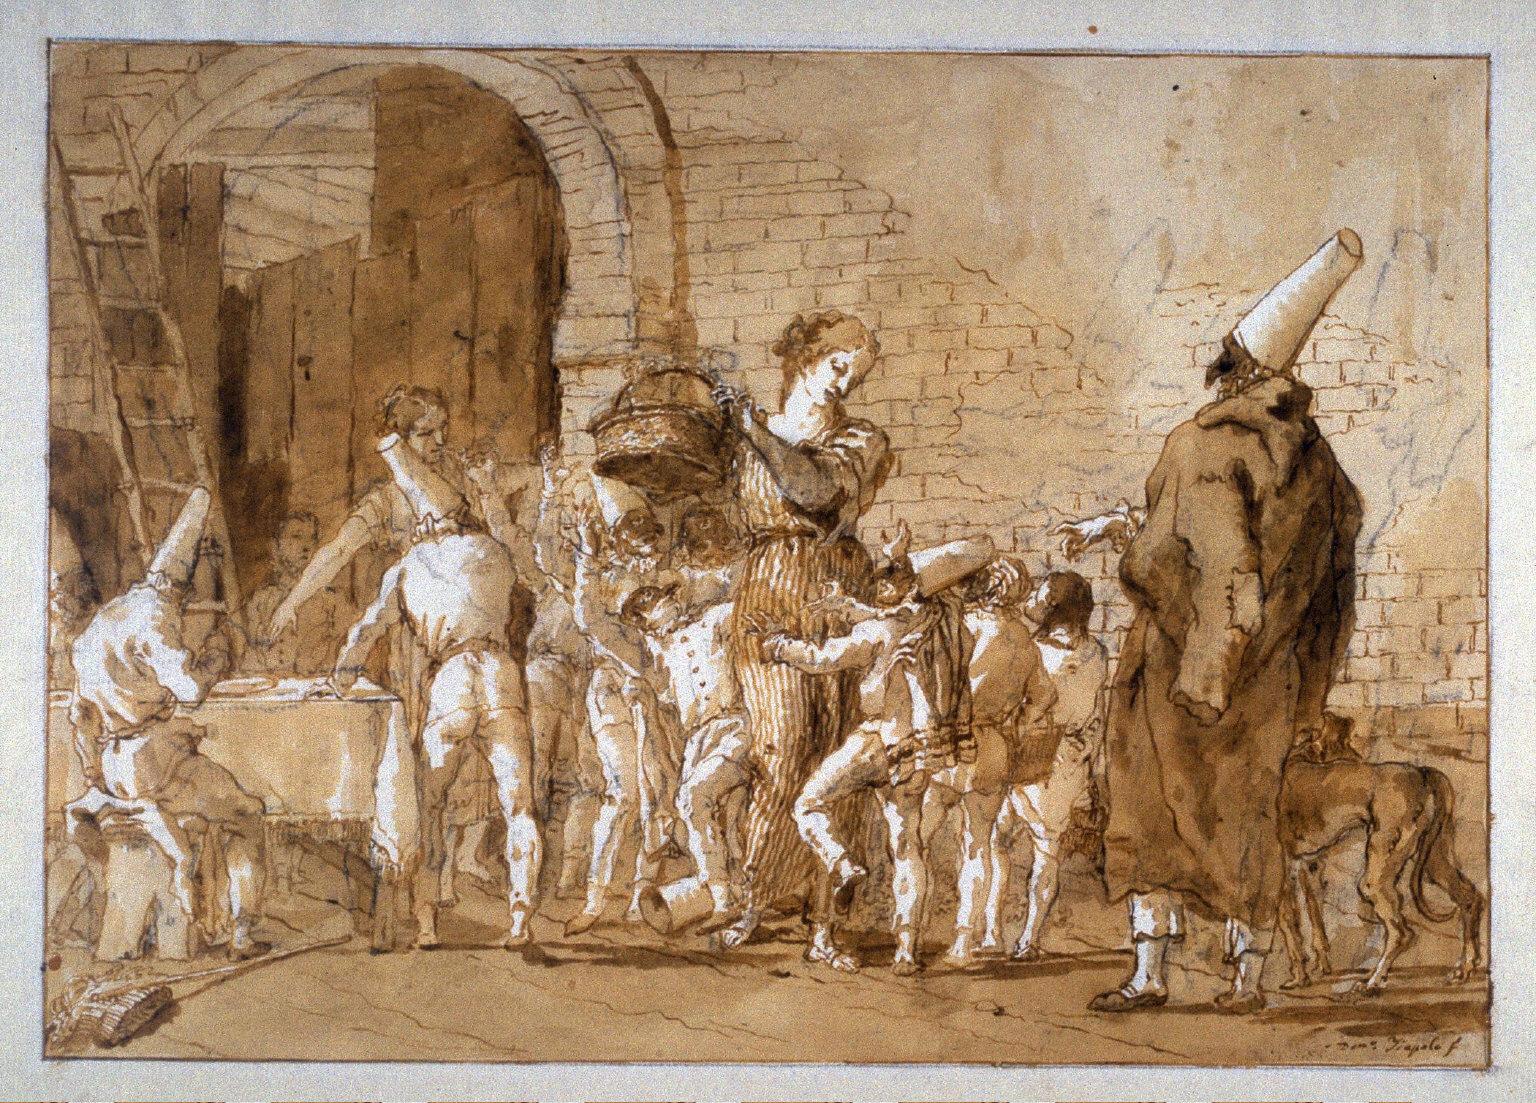 Punchinello's Children Begging for Sweets, no. 17 from the series Divertimento per gli ragazzi (Entertainment for Children)